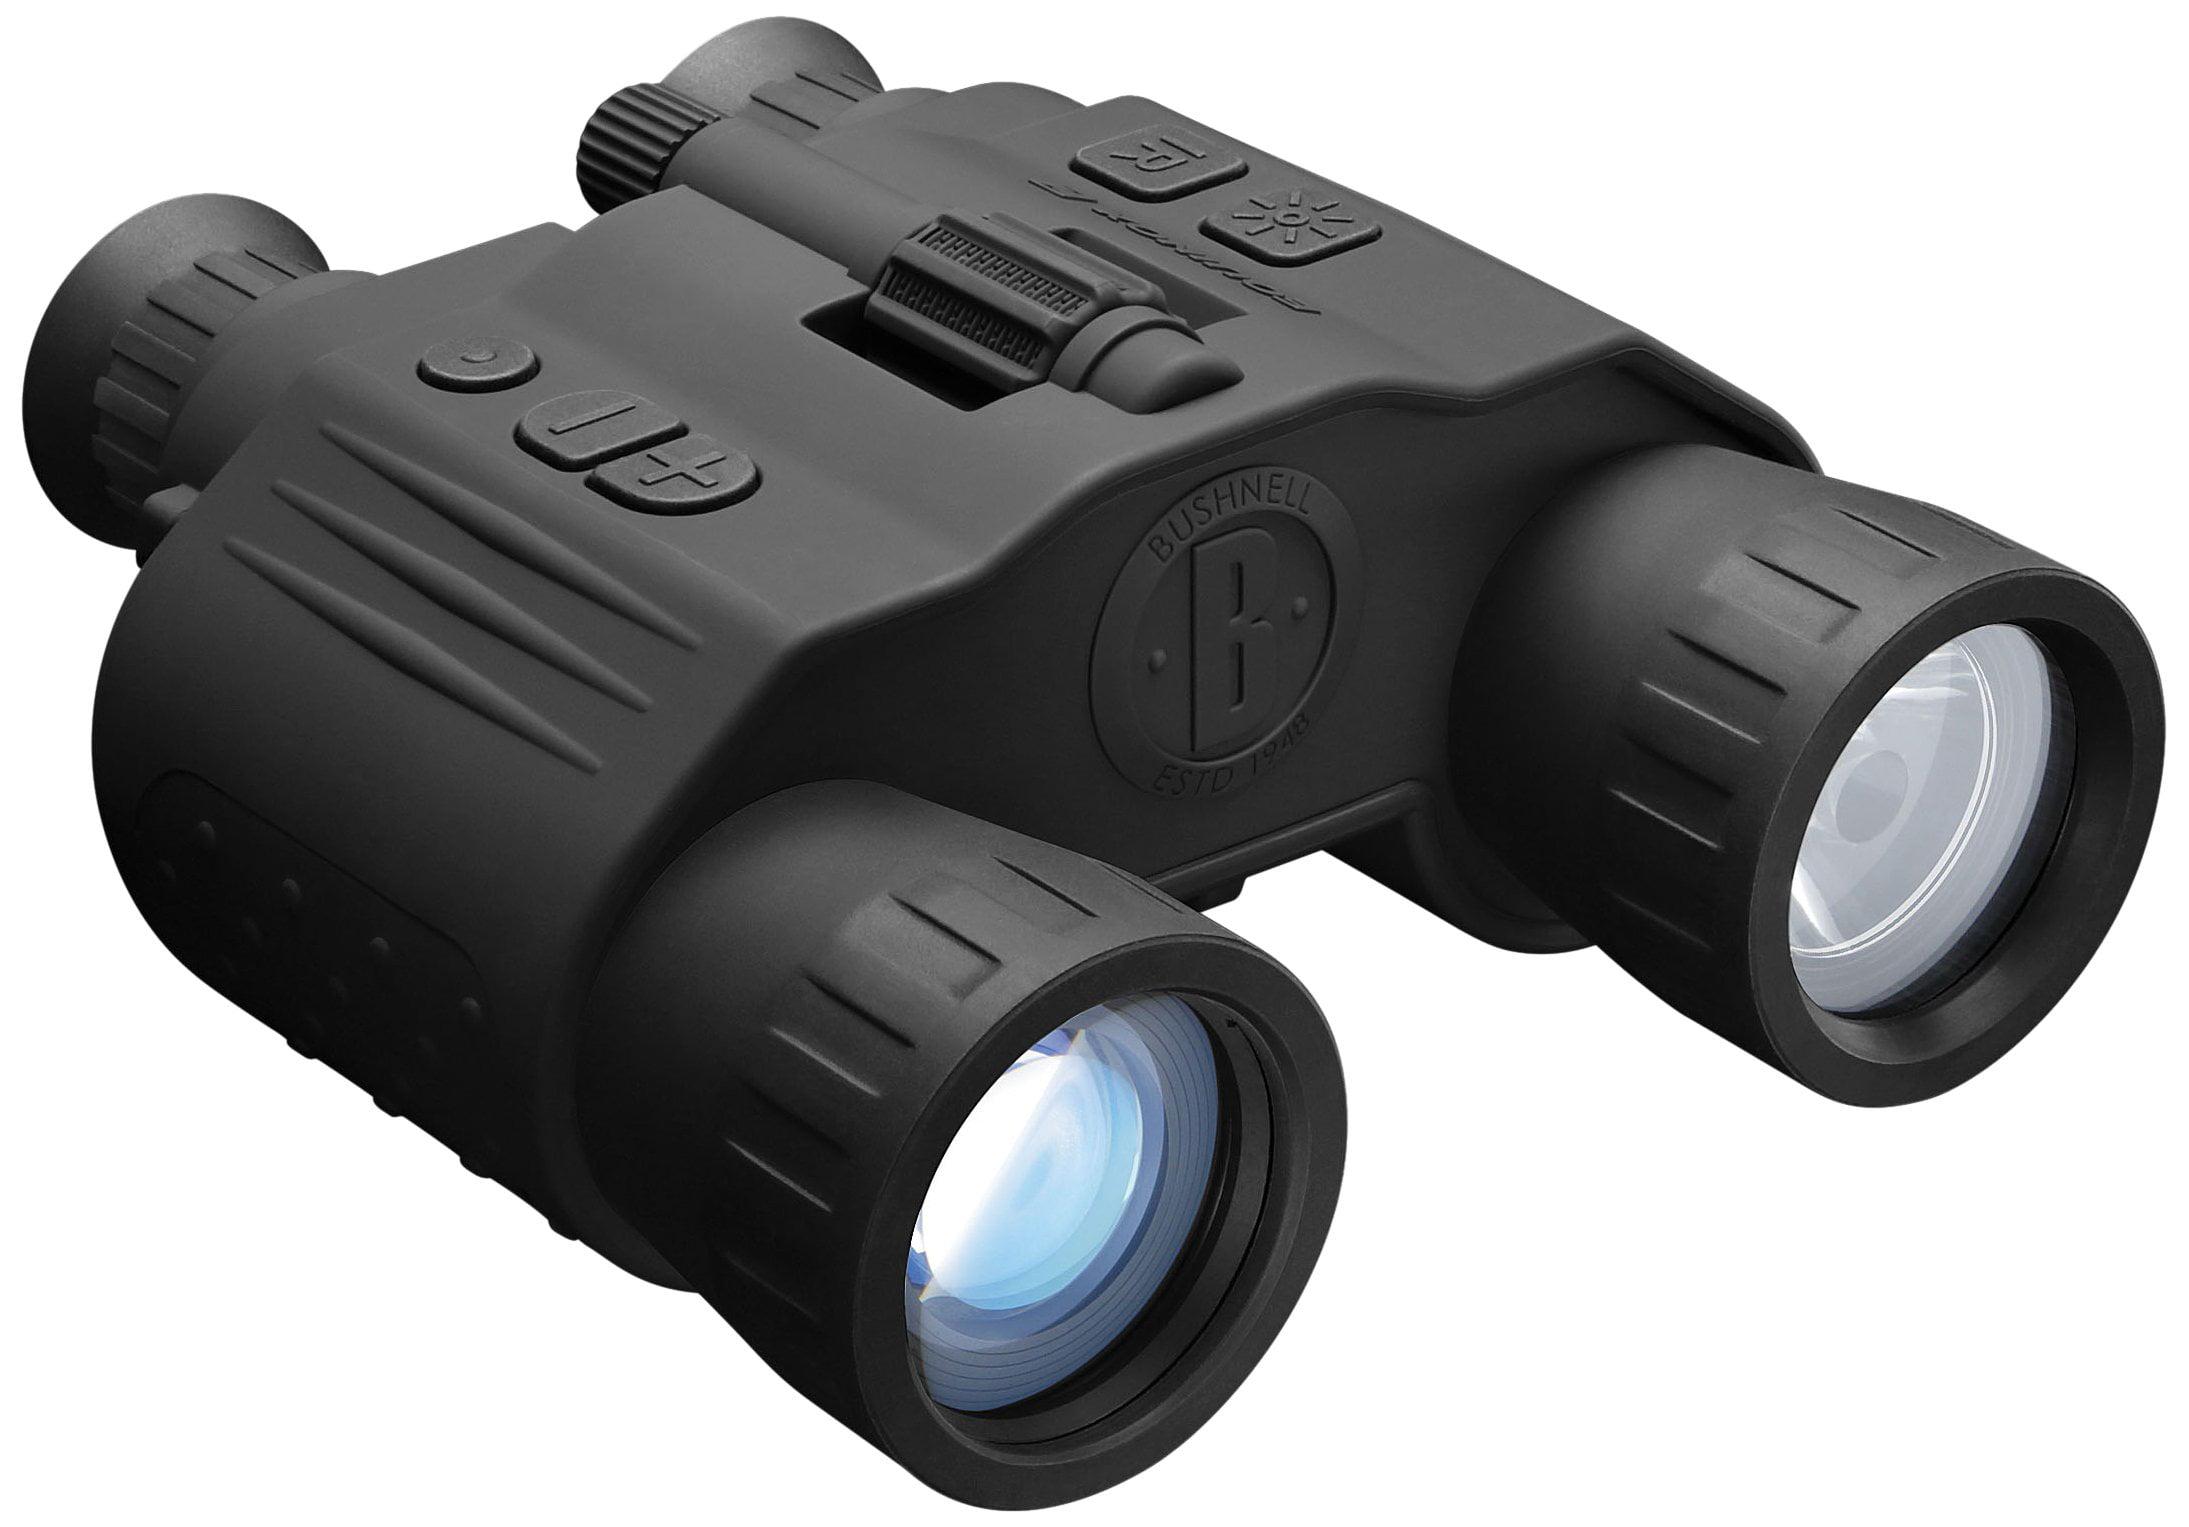 Bushnell 260500 Equinox[tm] Z 2 X40mm Binoculars With Digital Night Vision by Bushnell